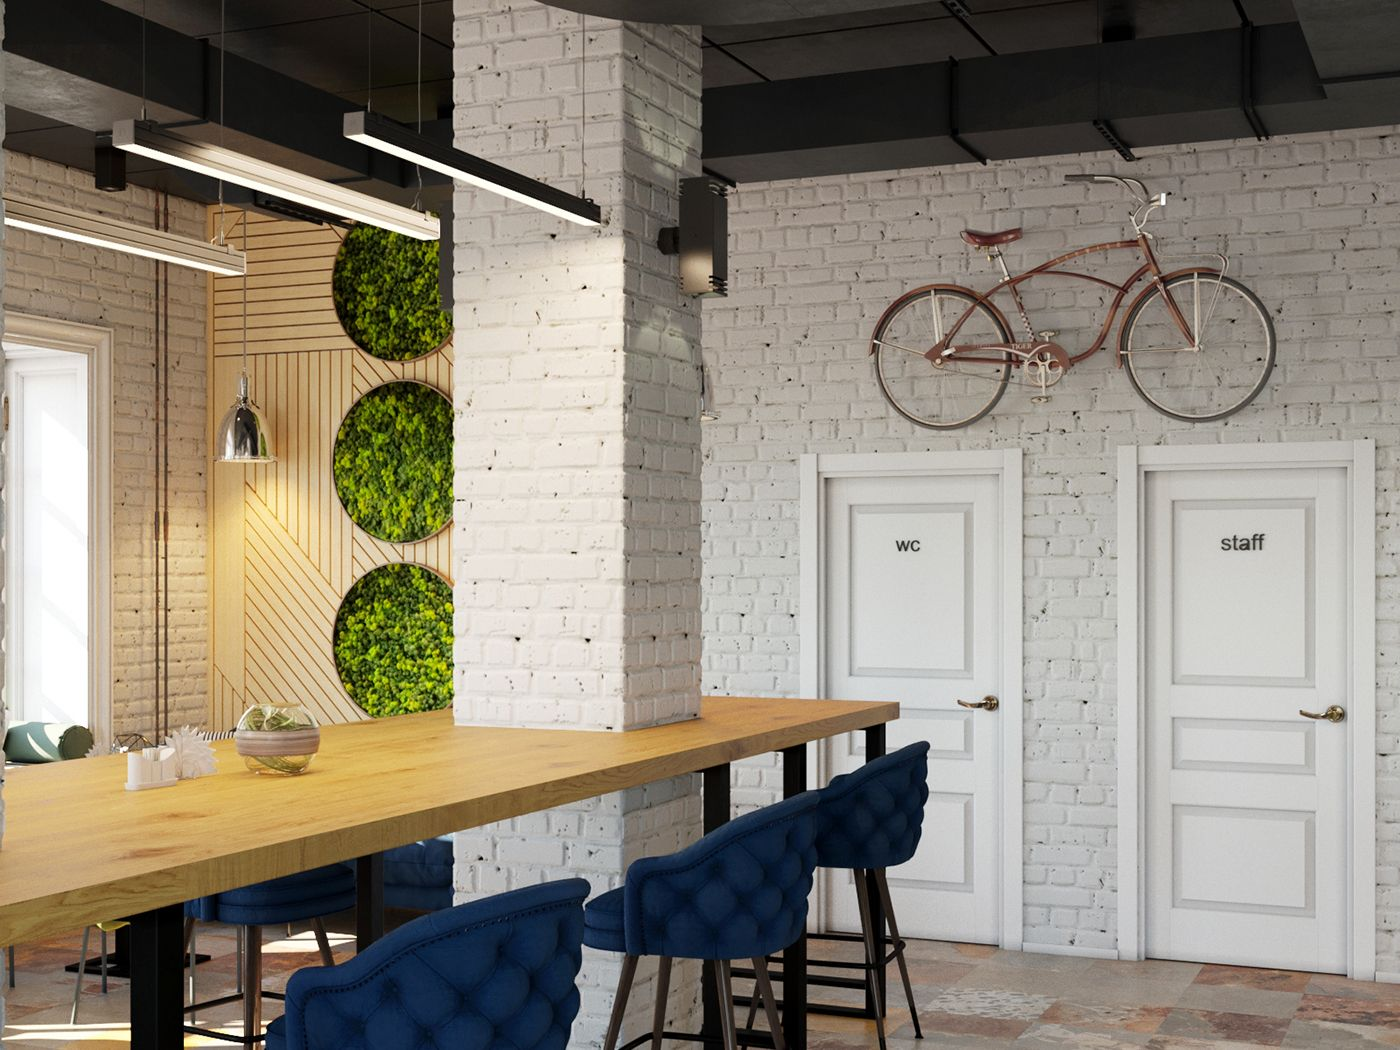 Interior of the cafe green leaf cafe on behance wood